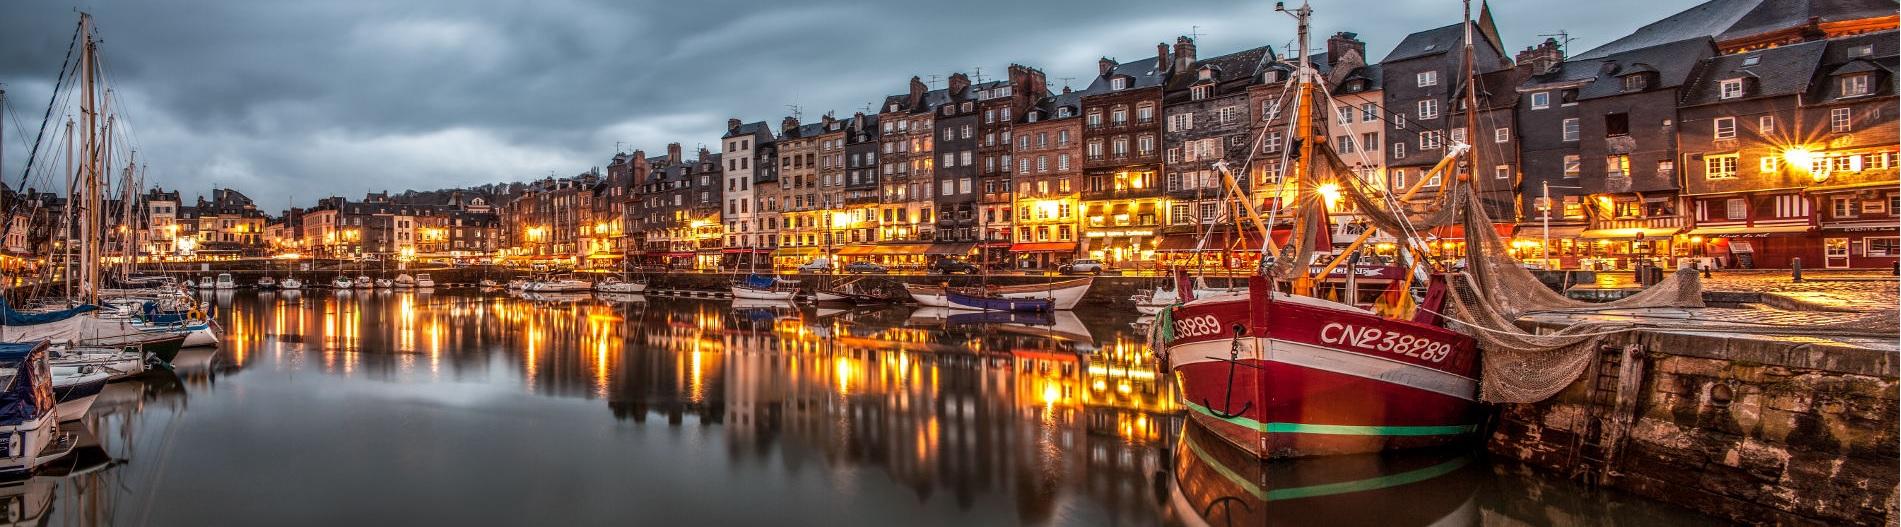 Нормандия из Парижа (Первый тур)